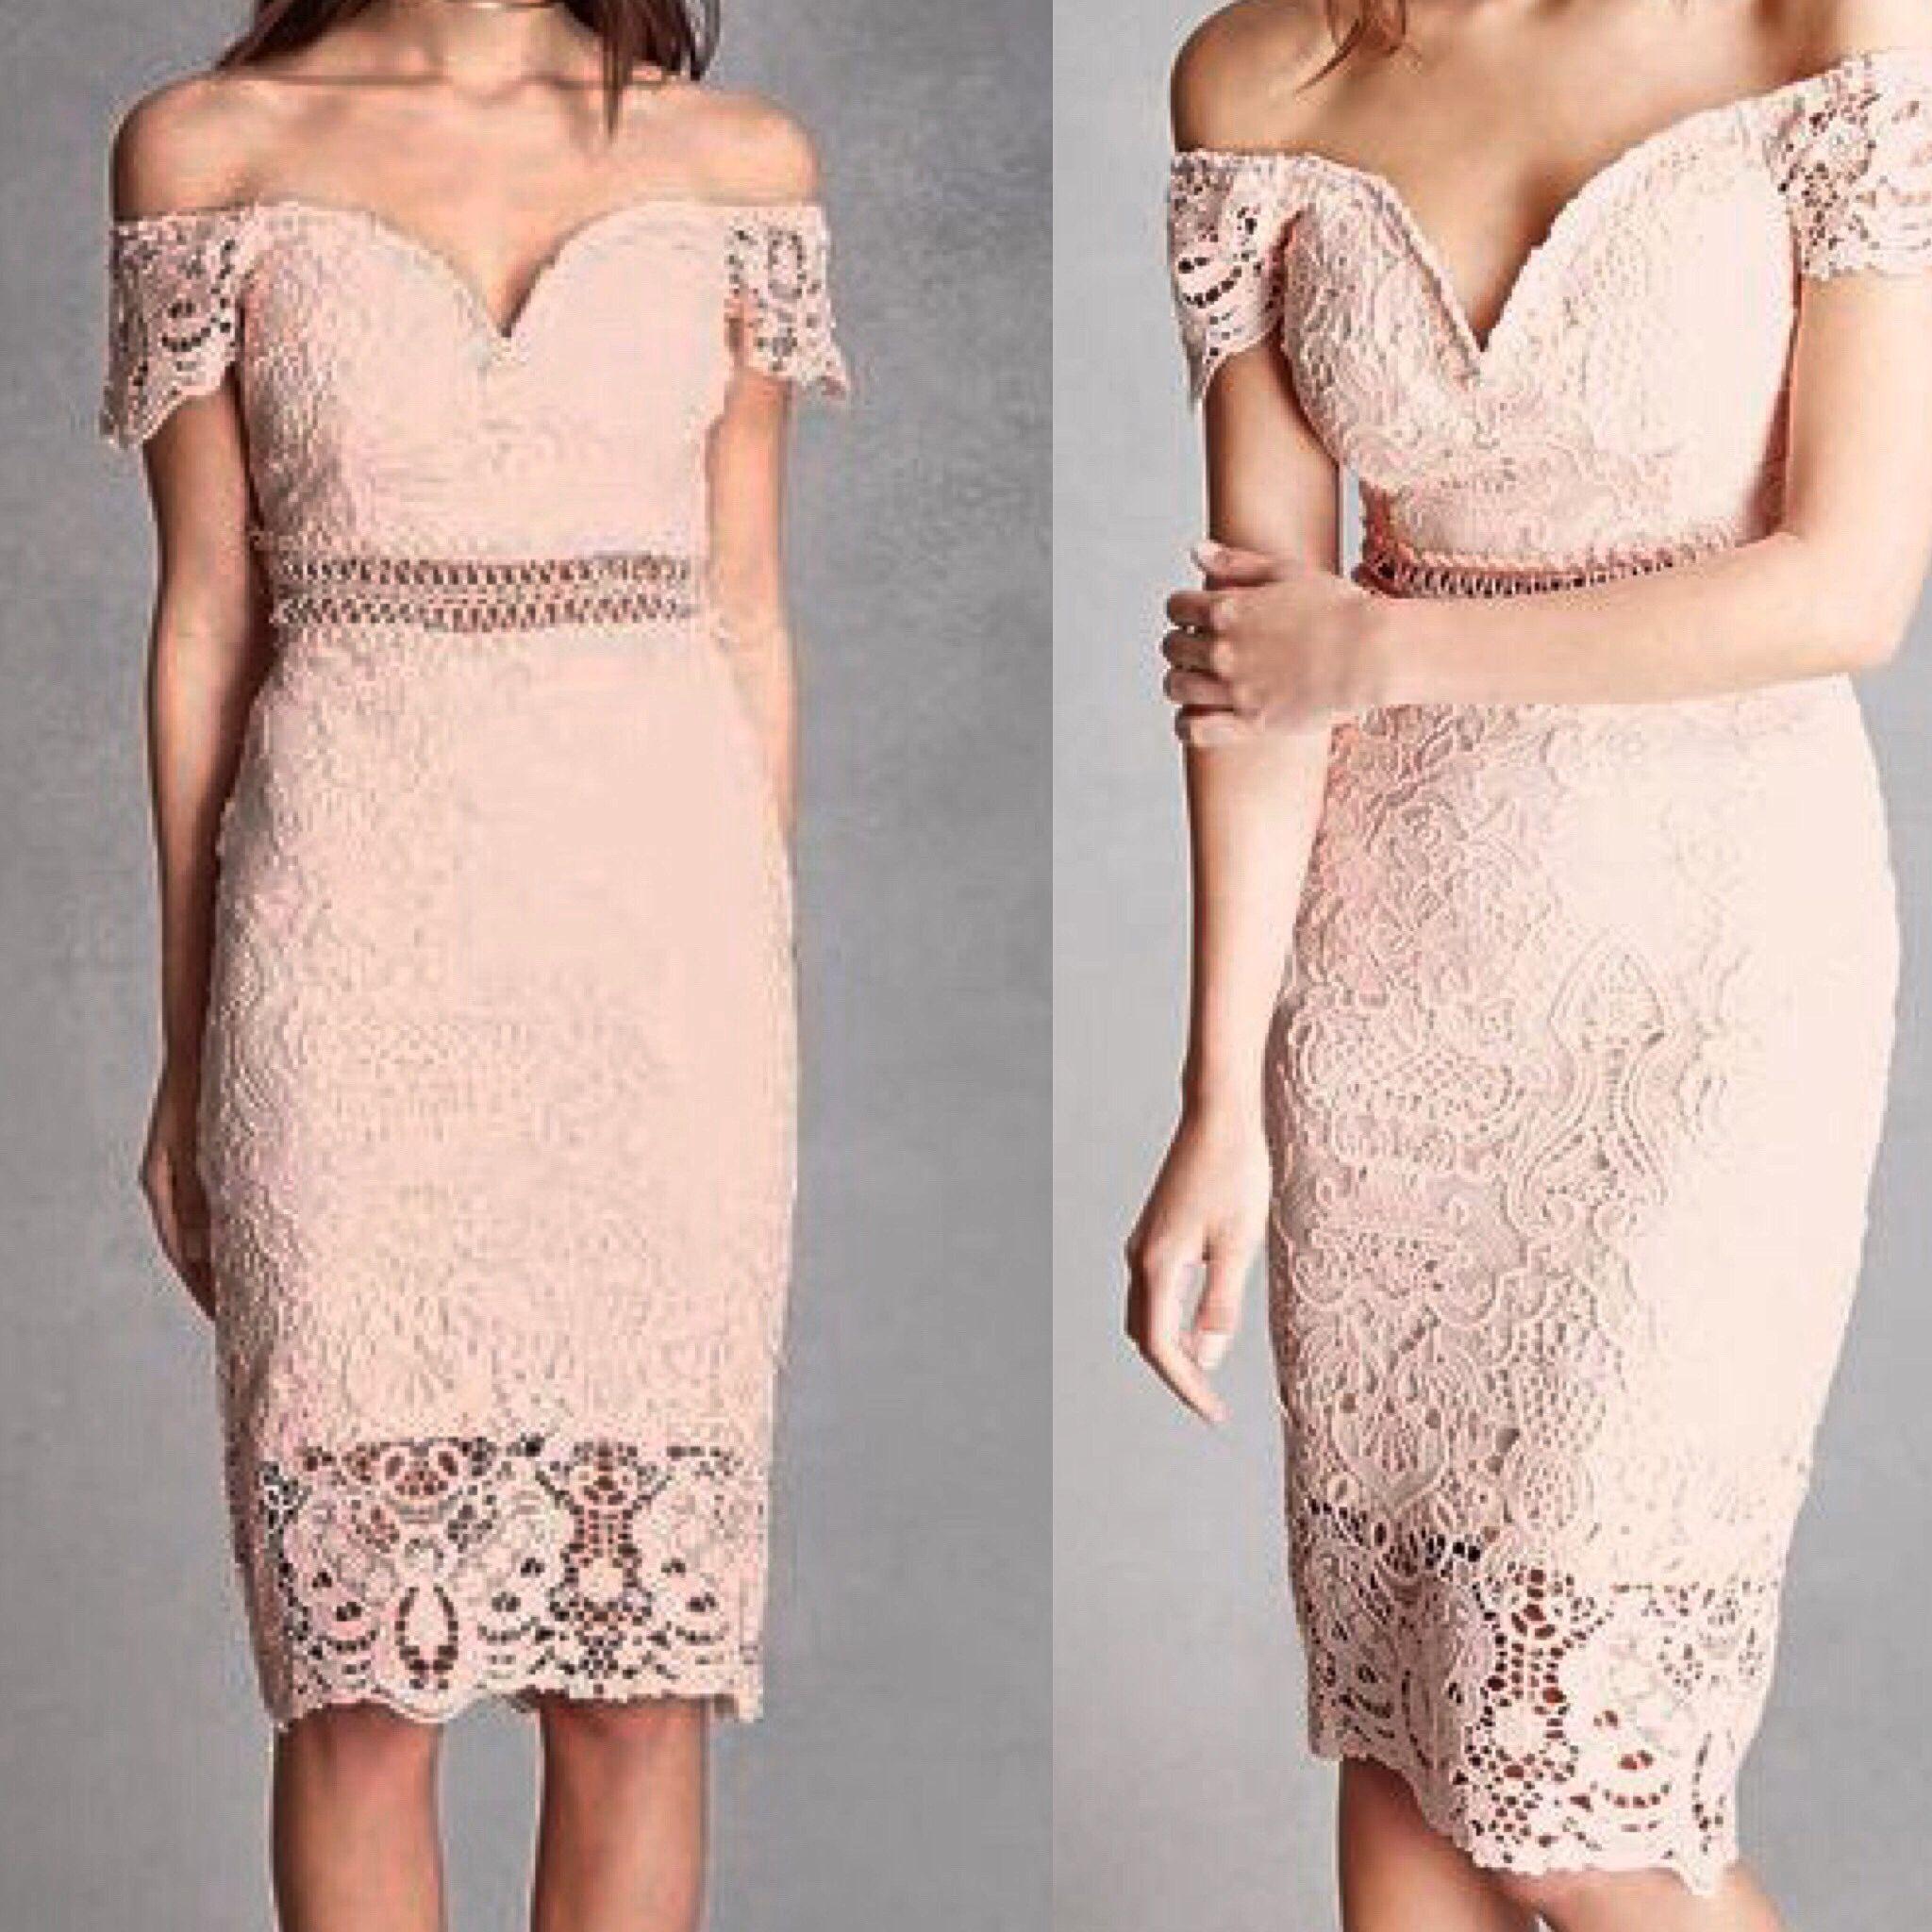 Vestido Soiéblu en guipur #modafeminina #fashion #fashion diaries ...